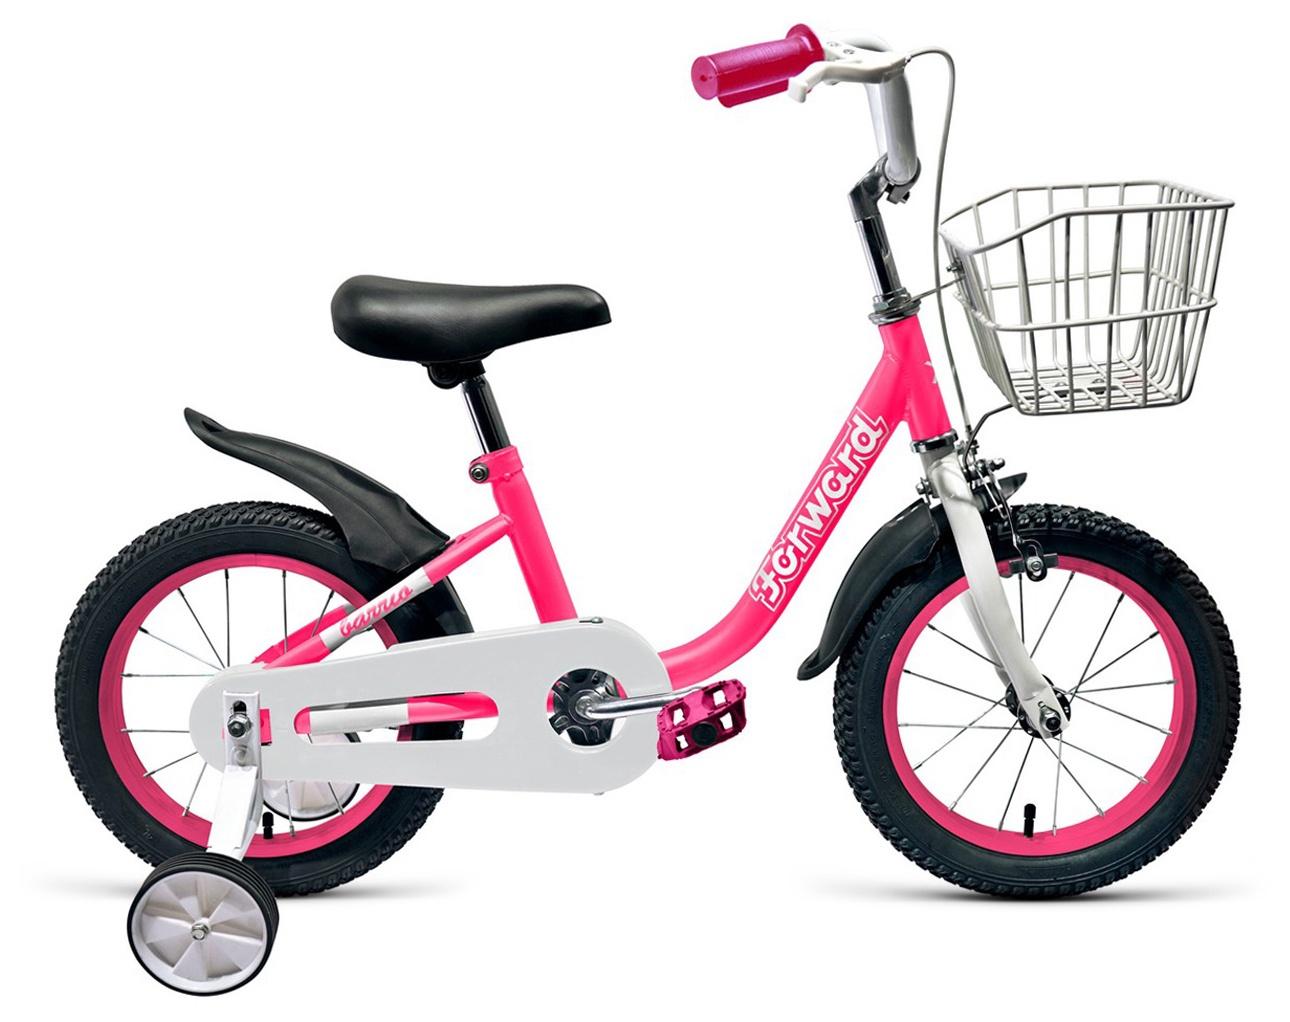 Велосипед Forward Barrio 18 2019, розовый велосипед forward barrio 14 2019